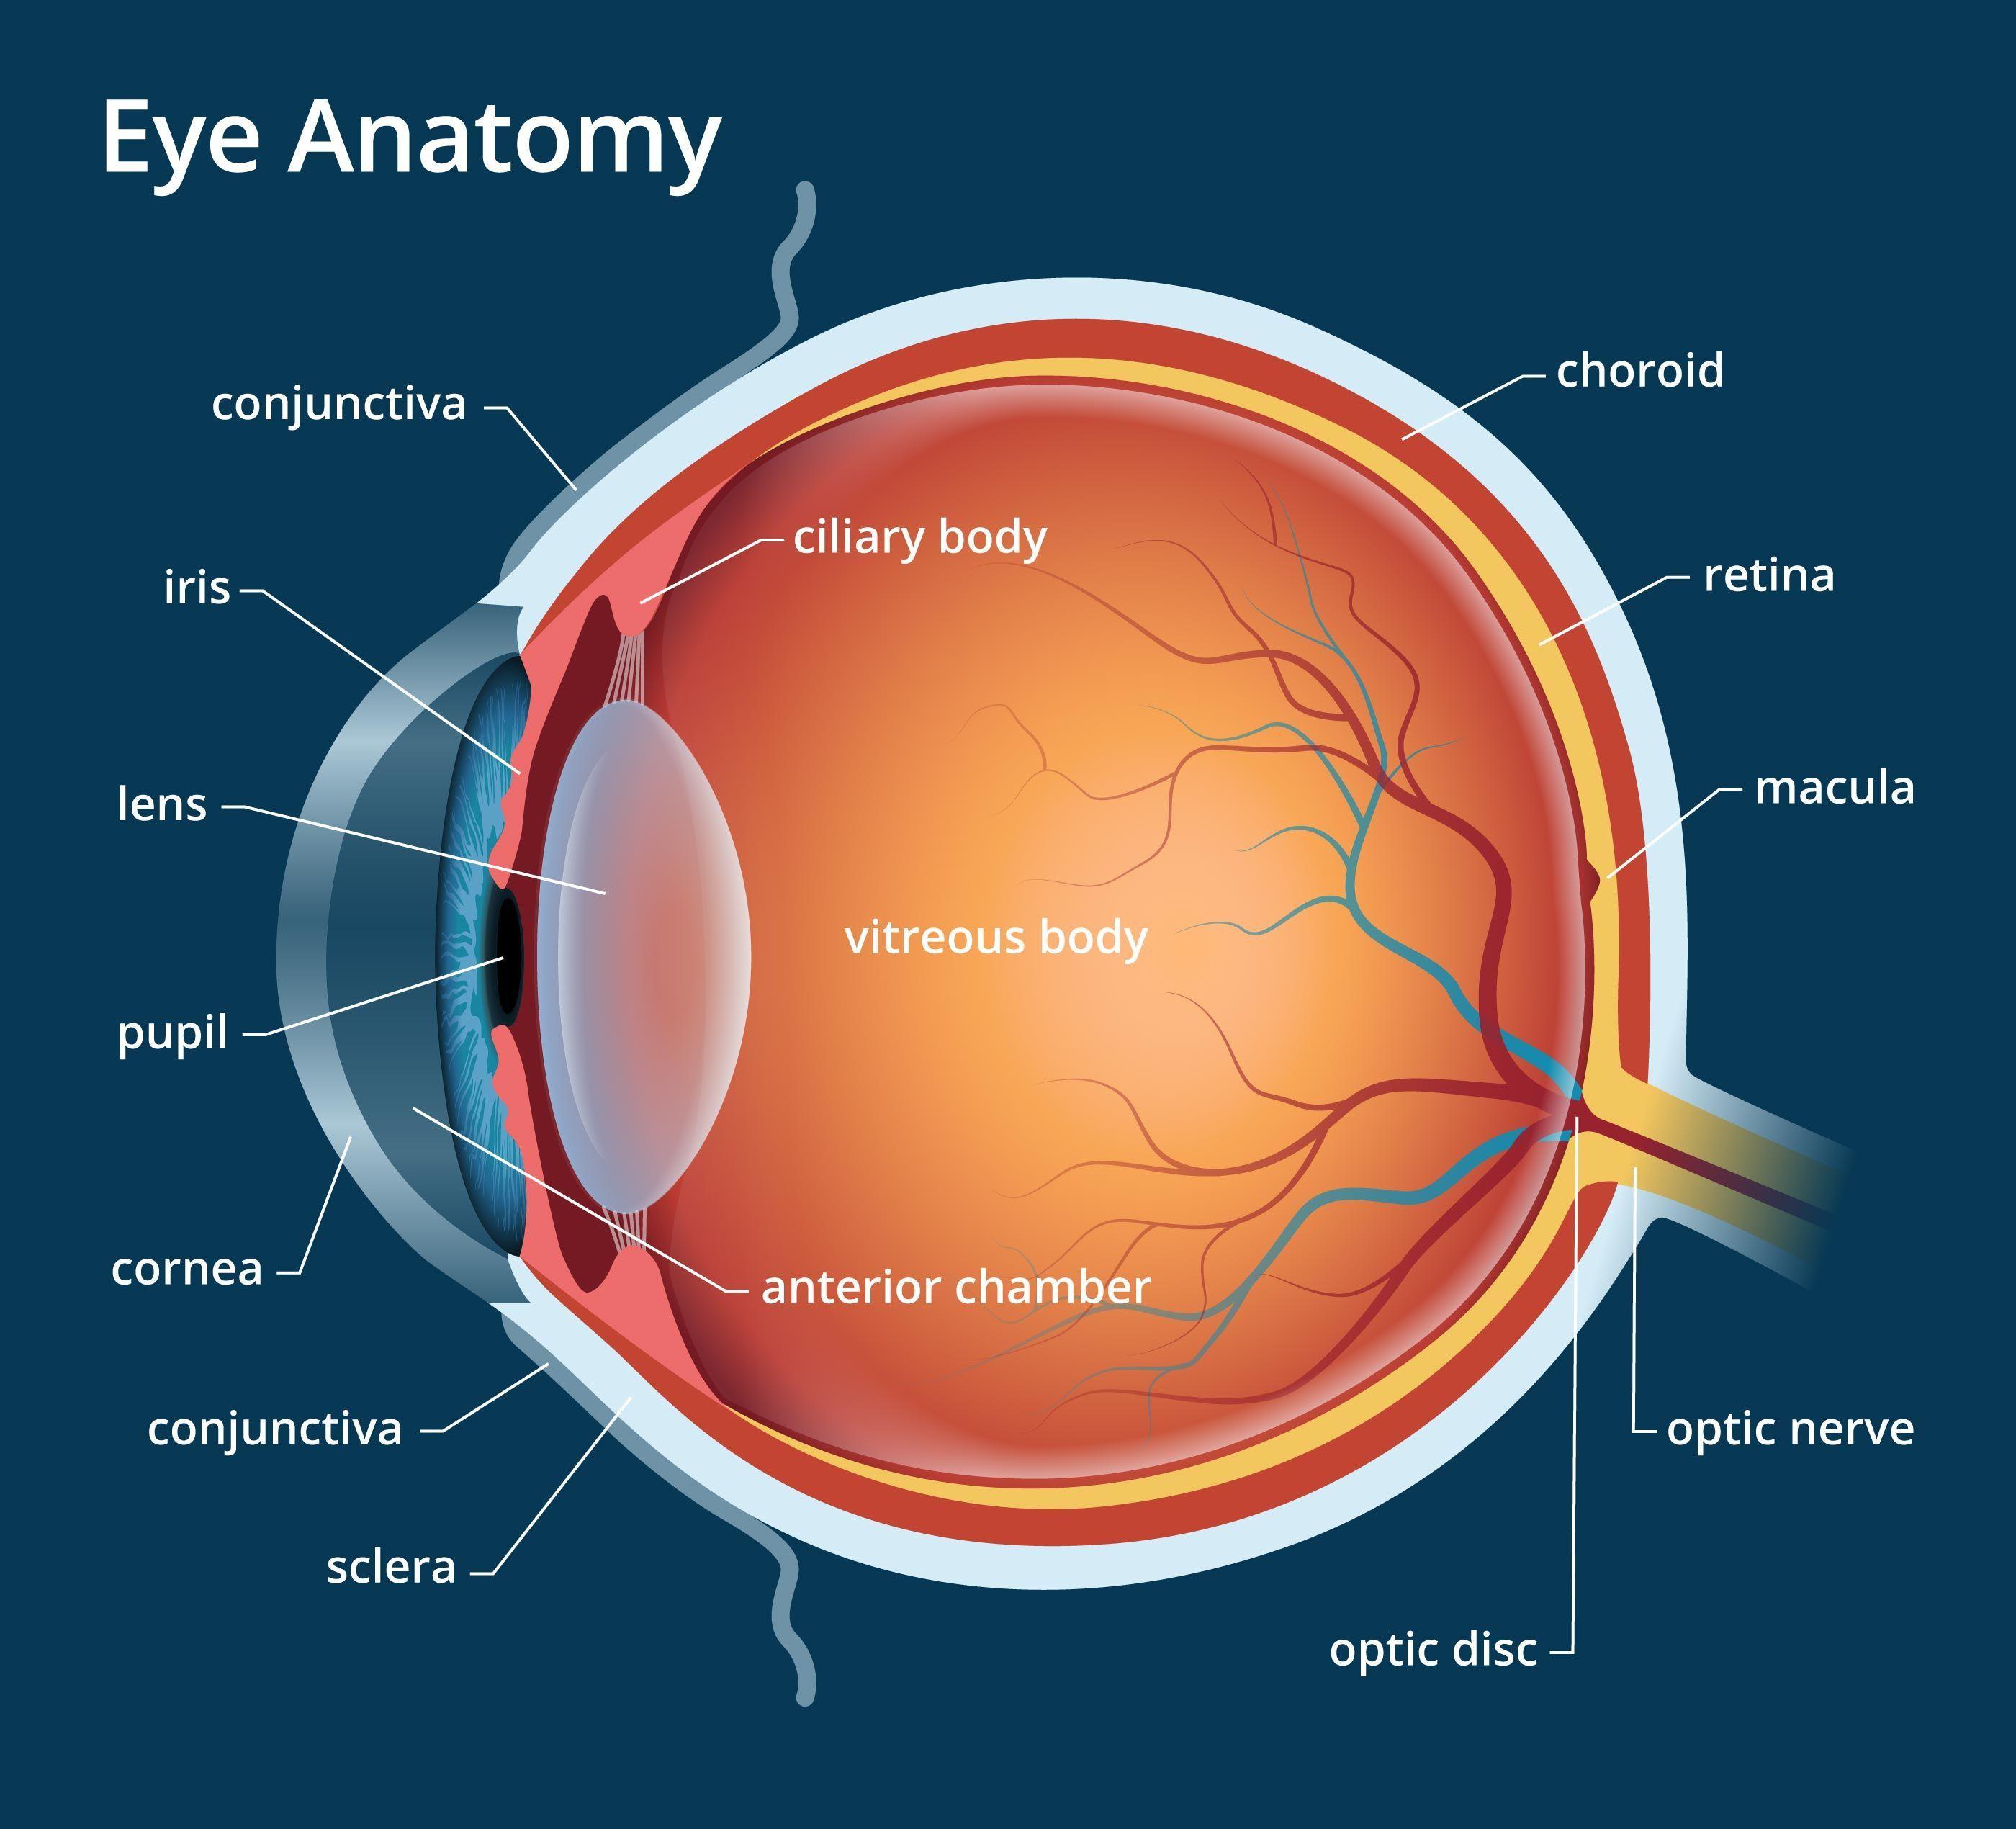 Human Eye Anatomy Parts Of The Eye Explained Bluetooth